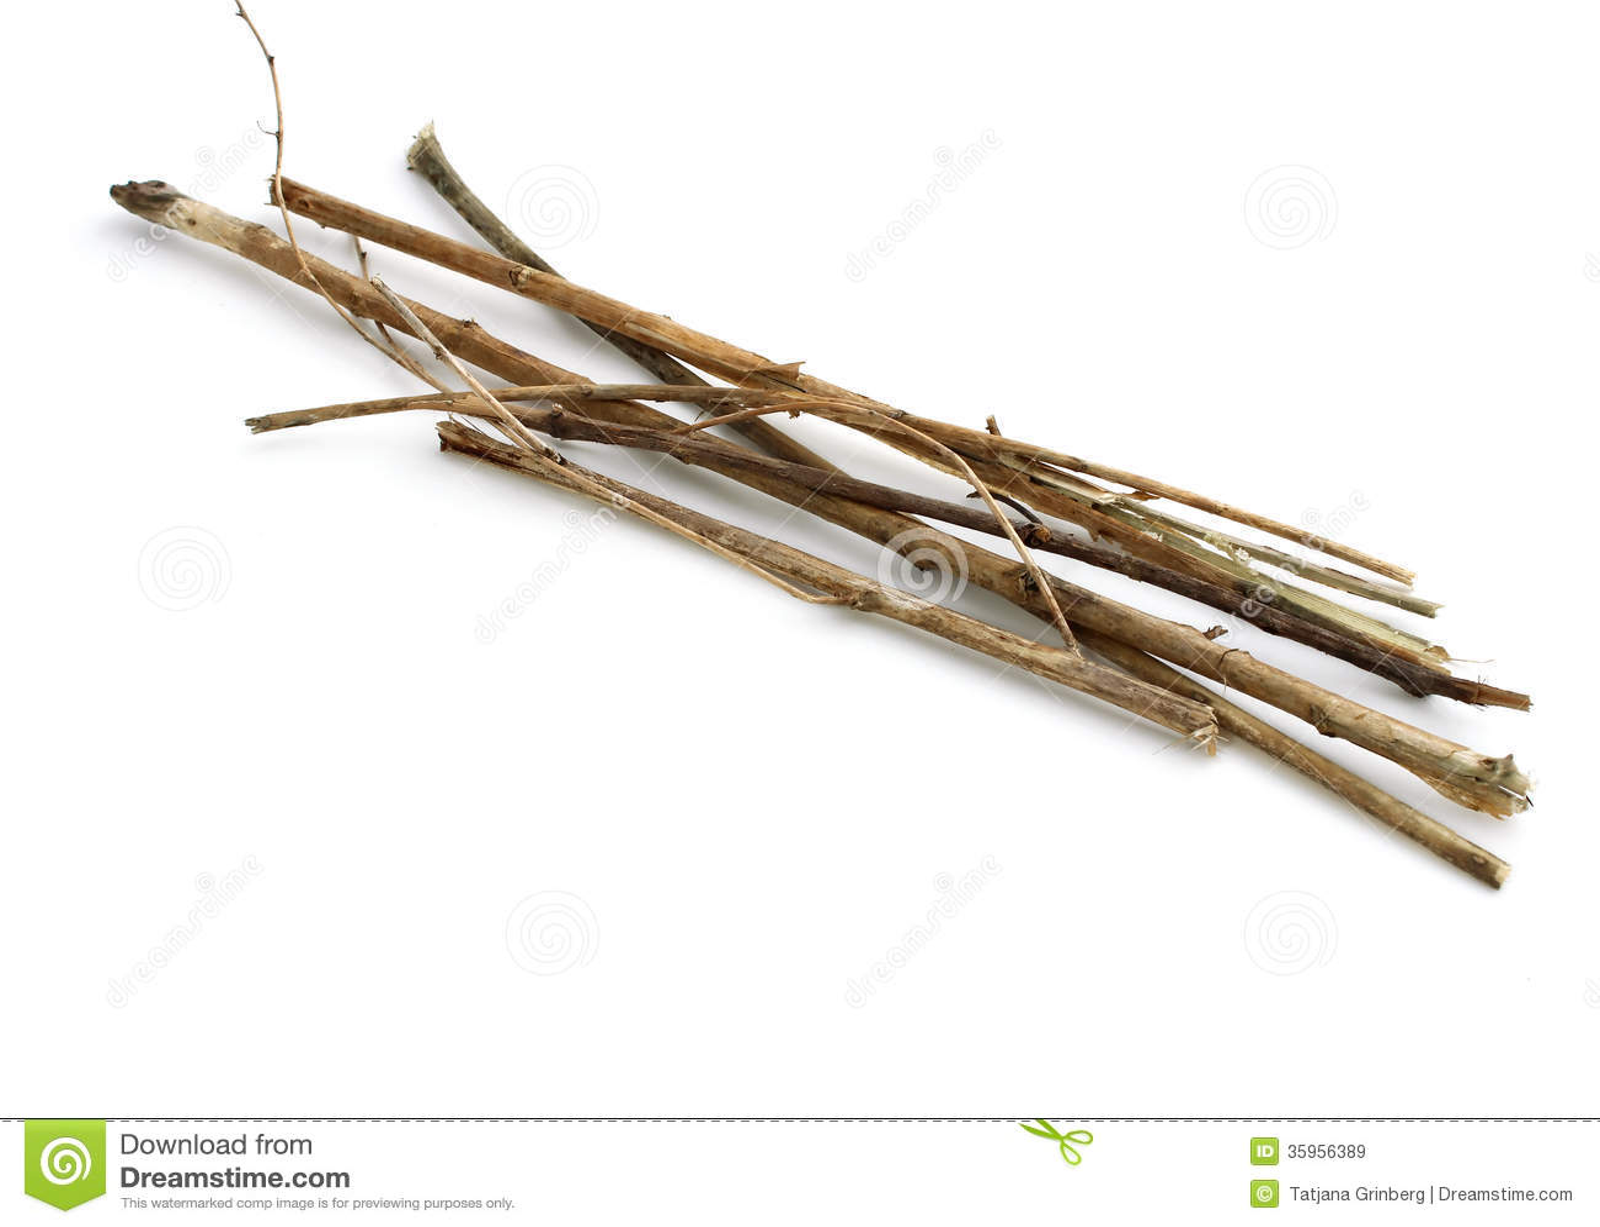 Stokken en takjes houten bundel op wit royalty vrije stock afbeeldingen afbeelding 35956389 - Blootgestelde houten bundel ...